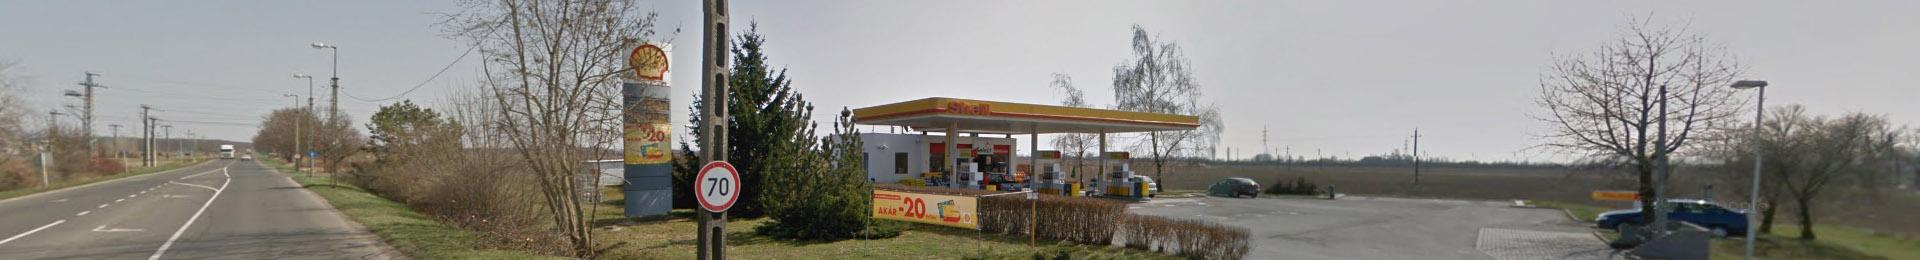 SHELL Benzinska pumpa